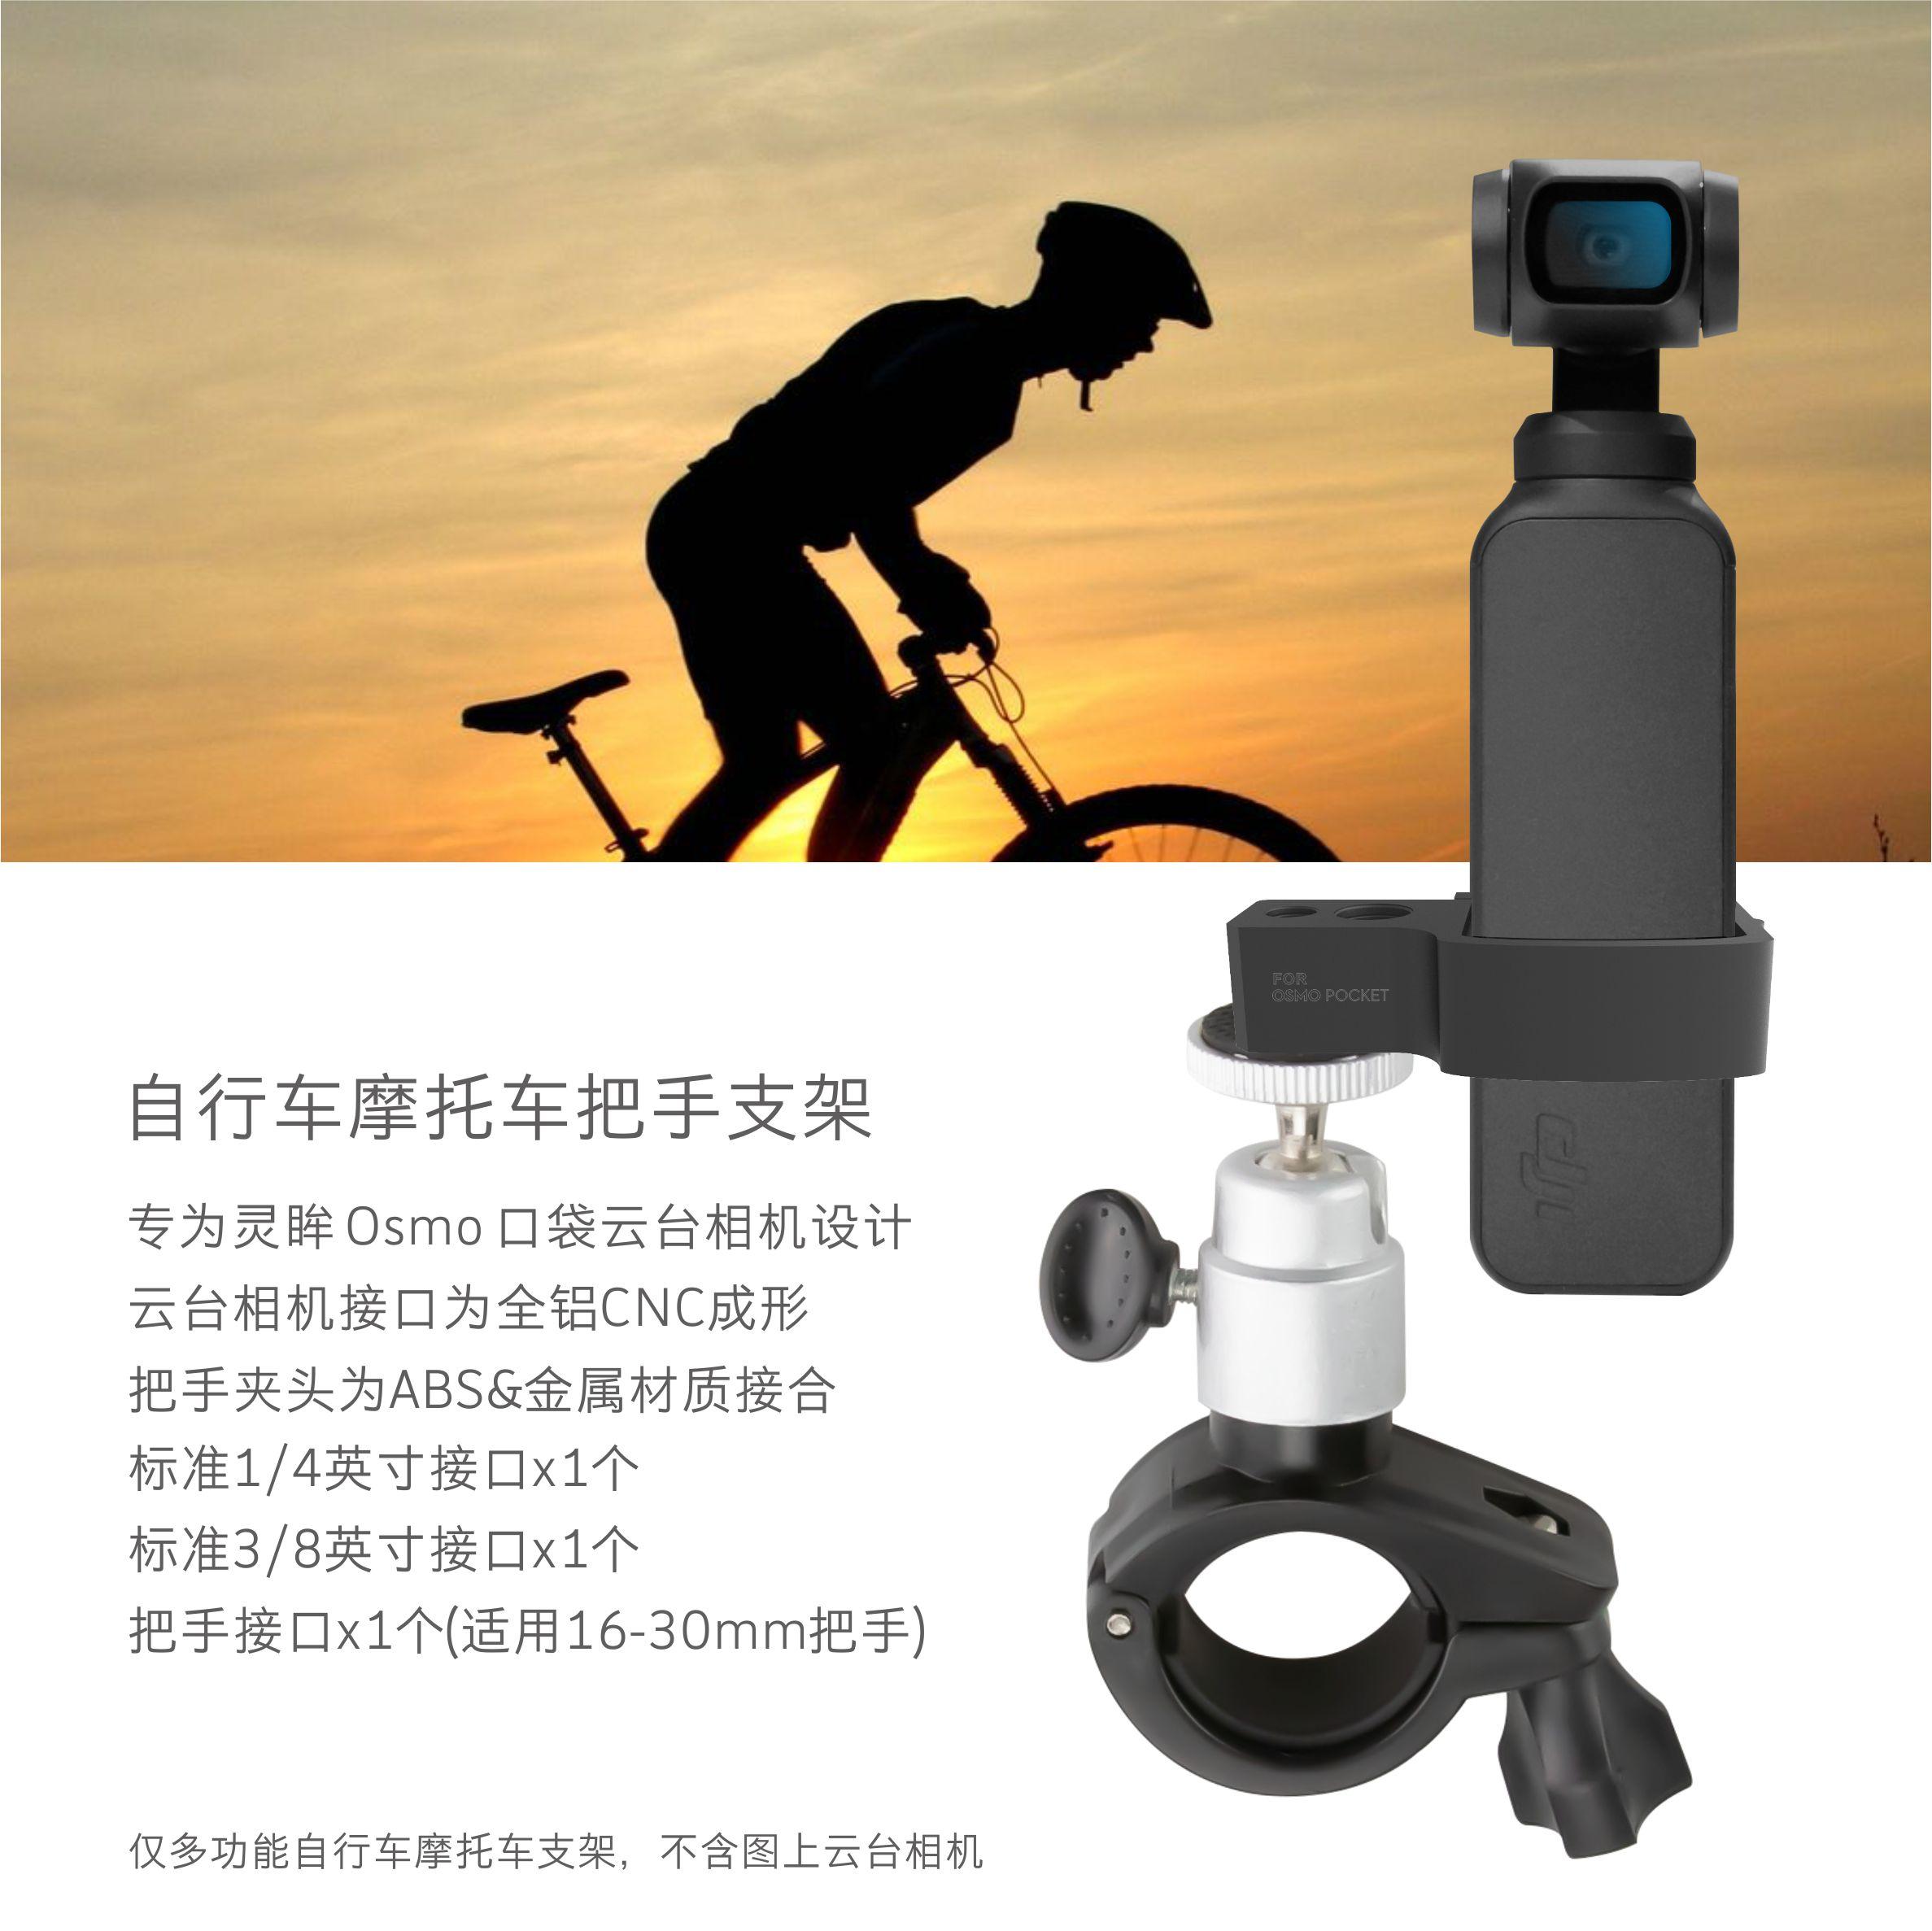 DJI大疆灵眸OSMO POCKET口袋云台手持云台拓展配件自行车摩托支架